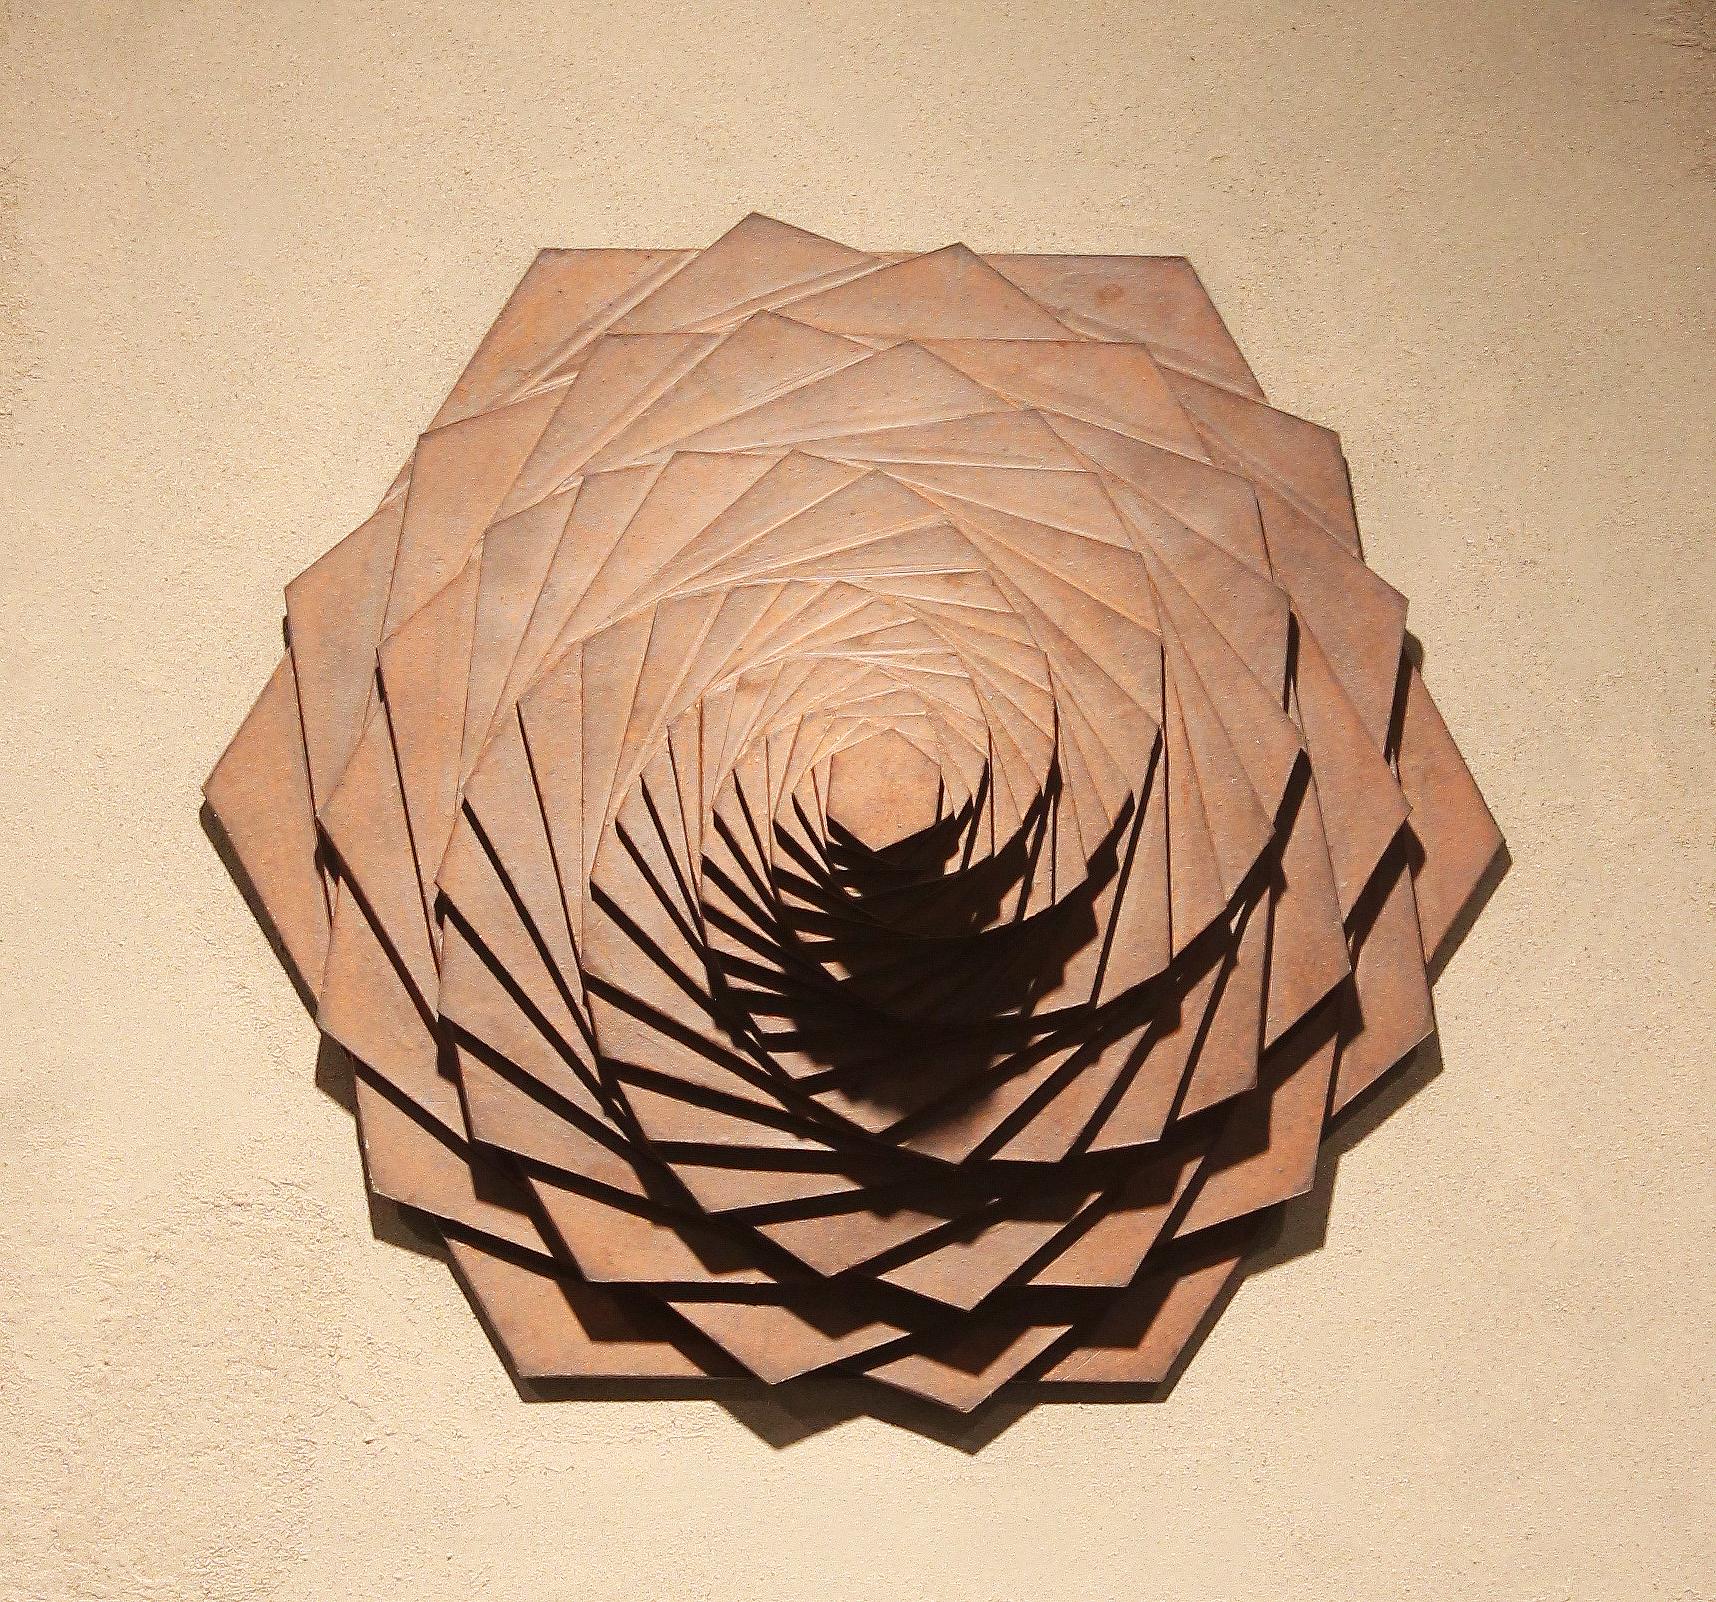 Harmonic Geometry III  |  18 x 18 x 9 inches  | Stoneware, Stained birch, Sand  |  2015